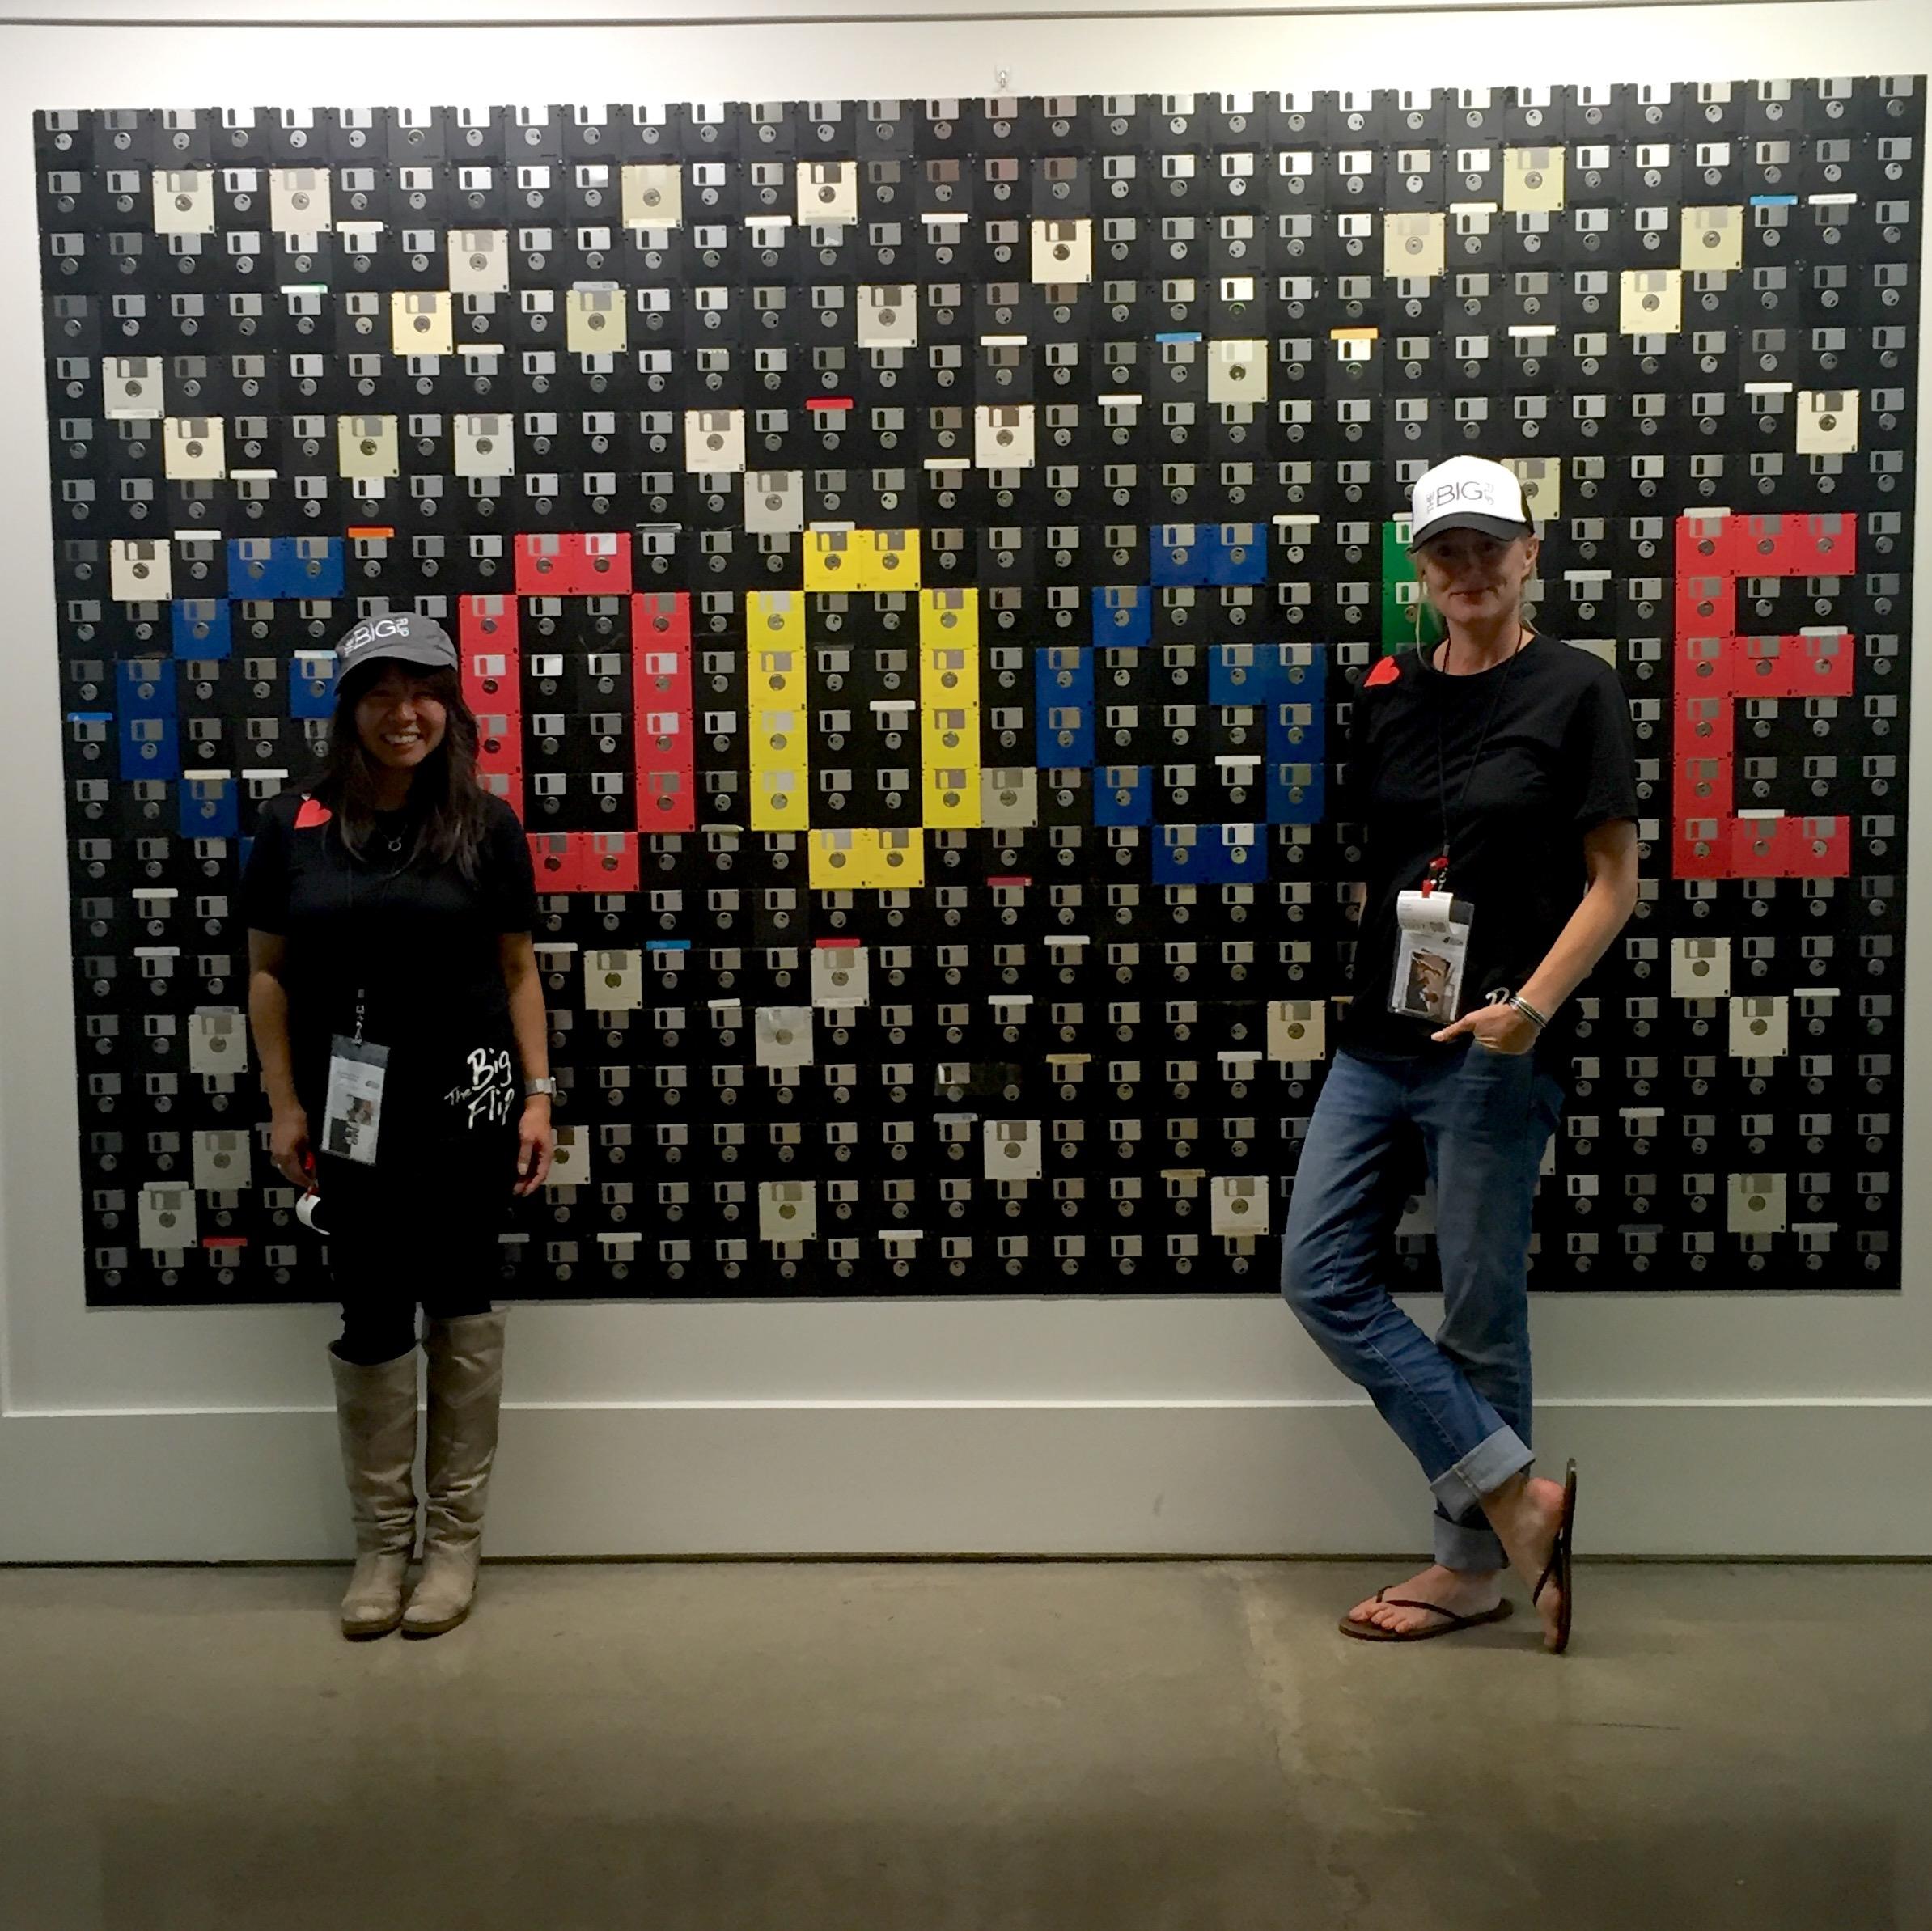 Admiring the floppy disk art at Google